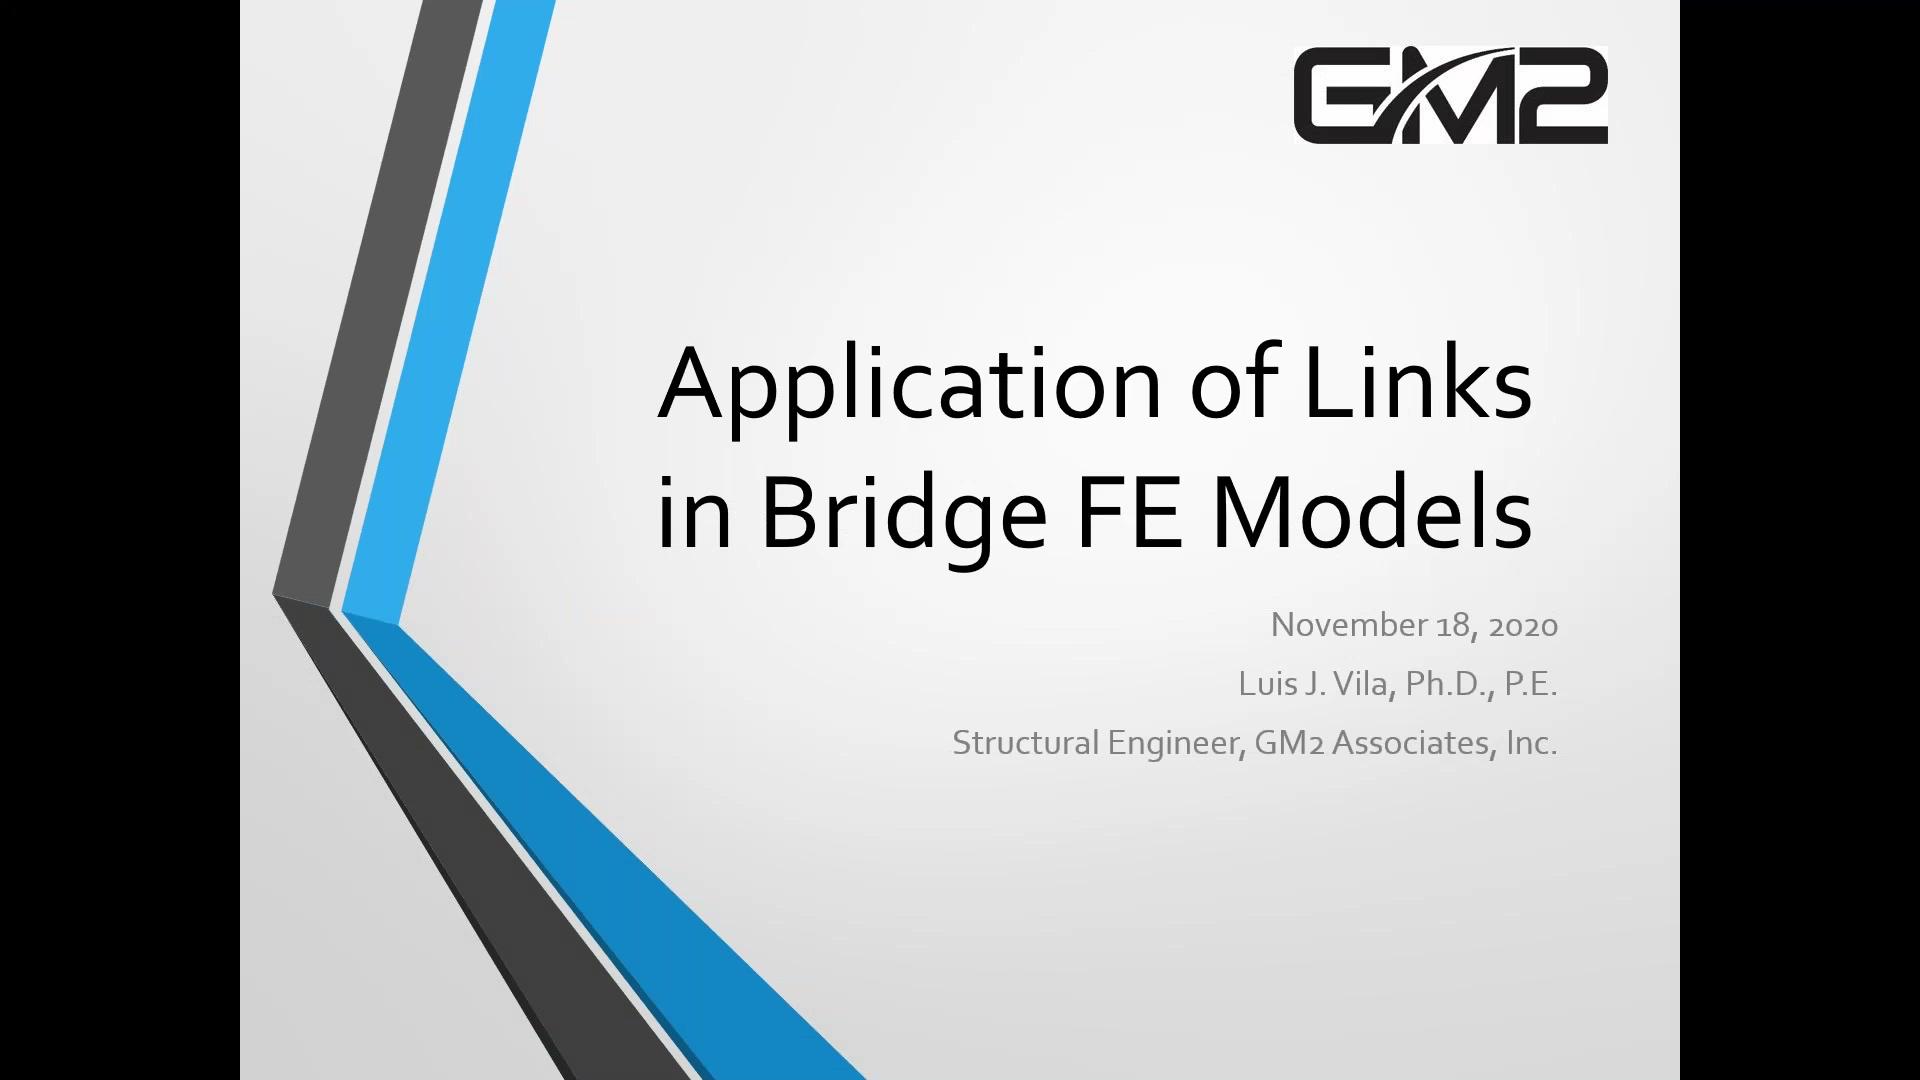 Application of Links in Bridge FE Models